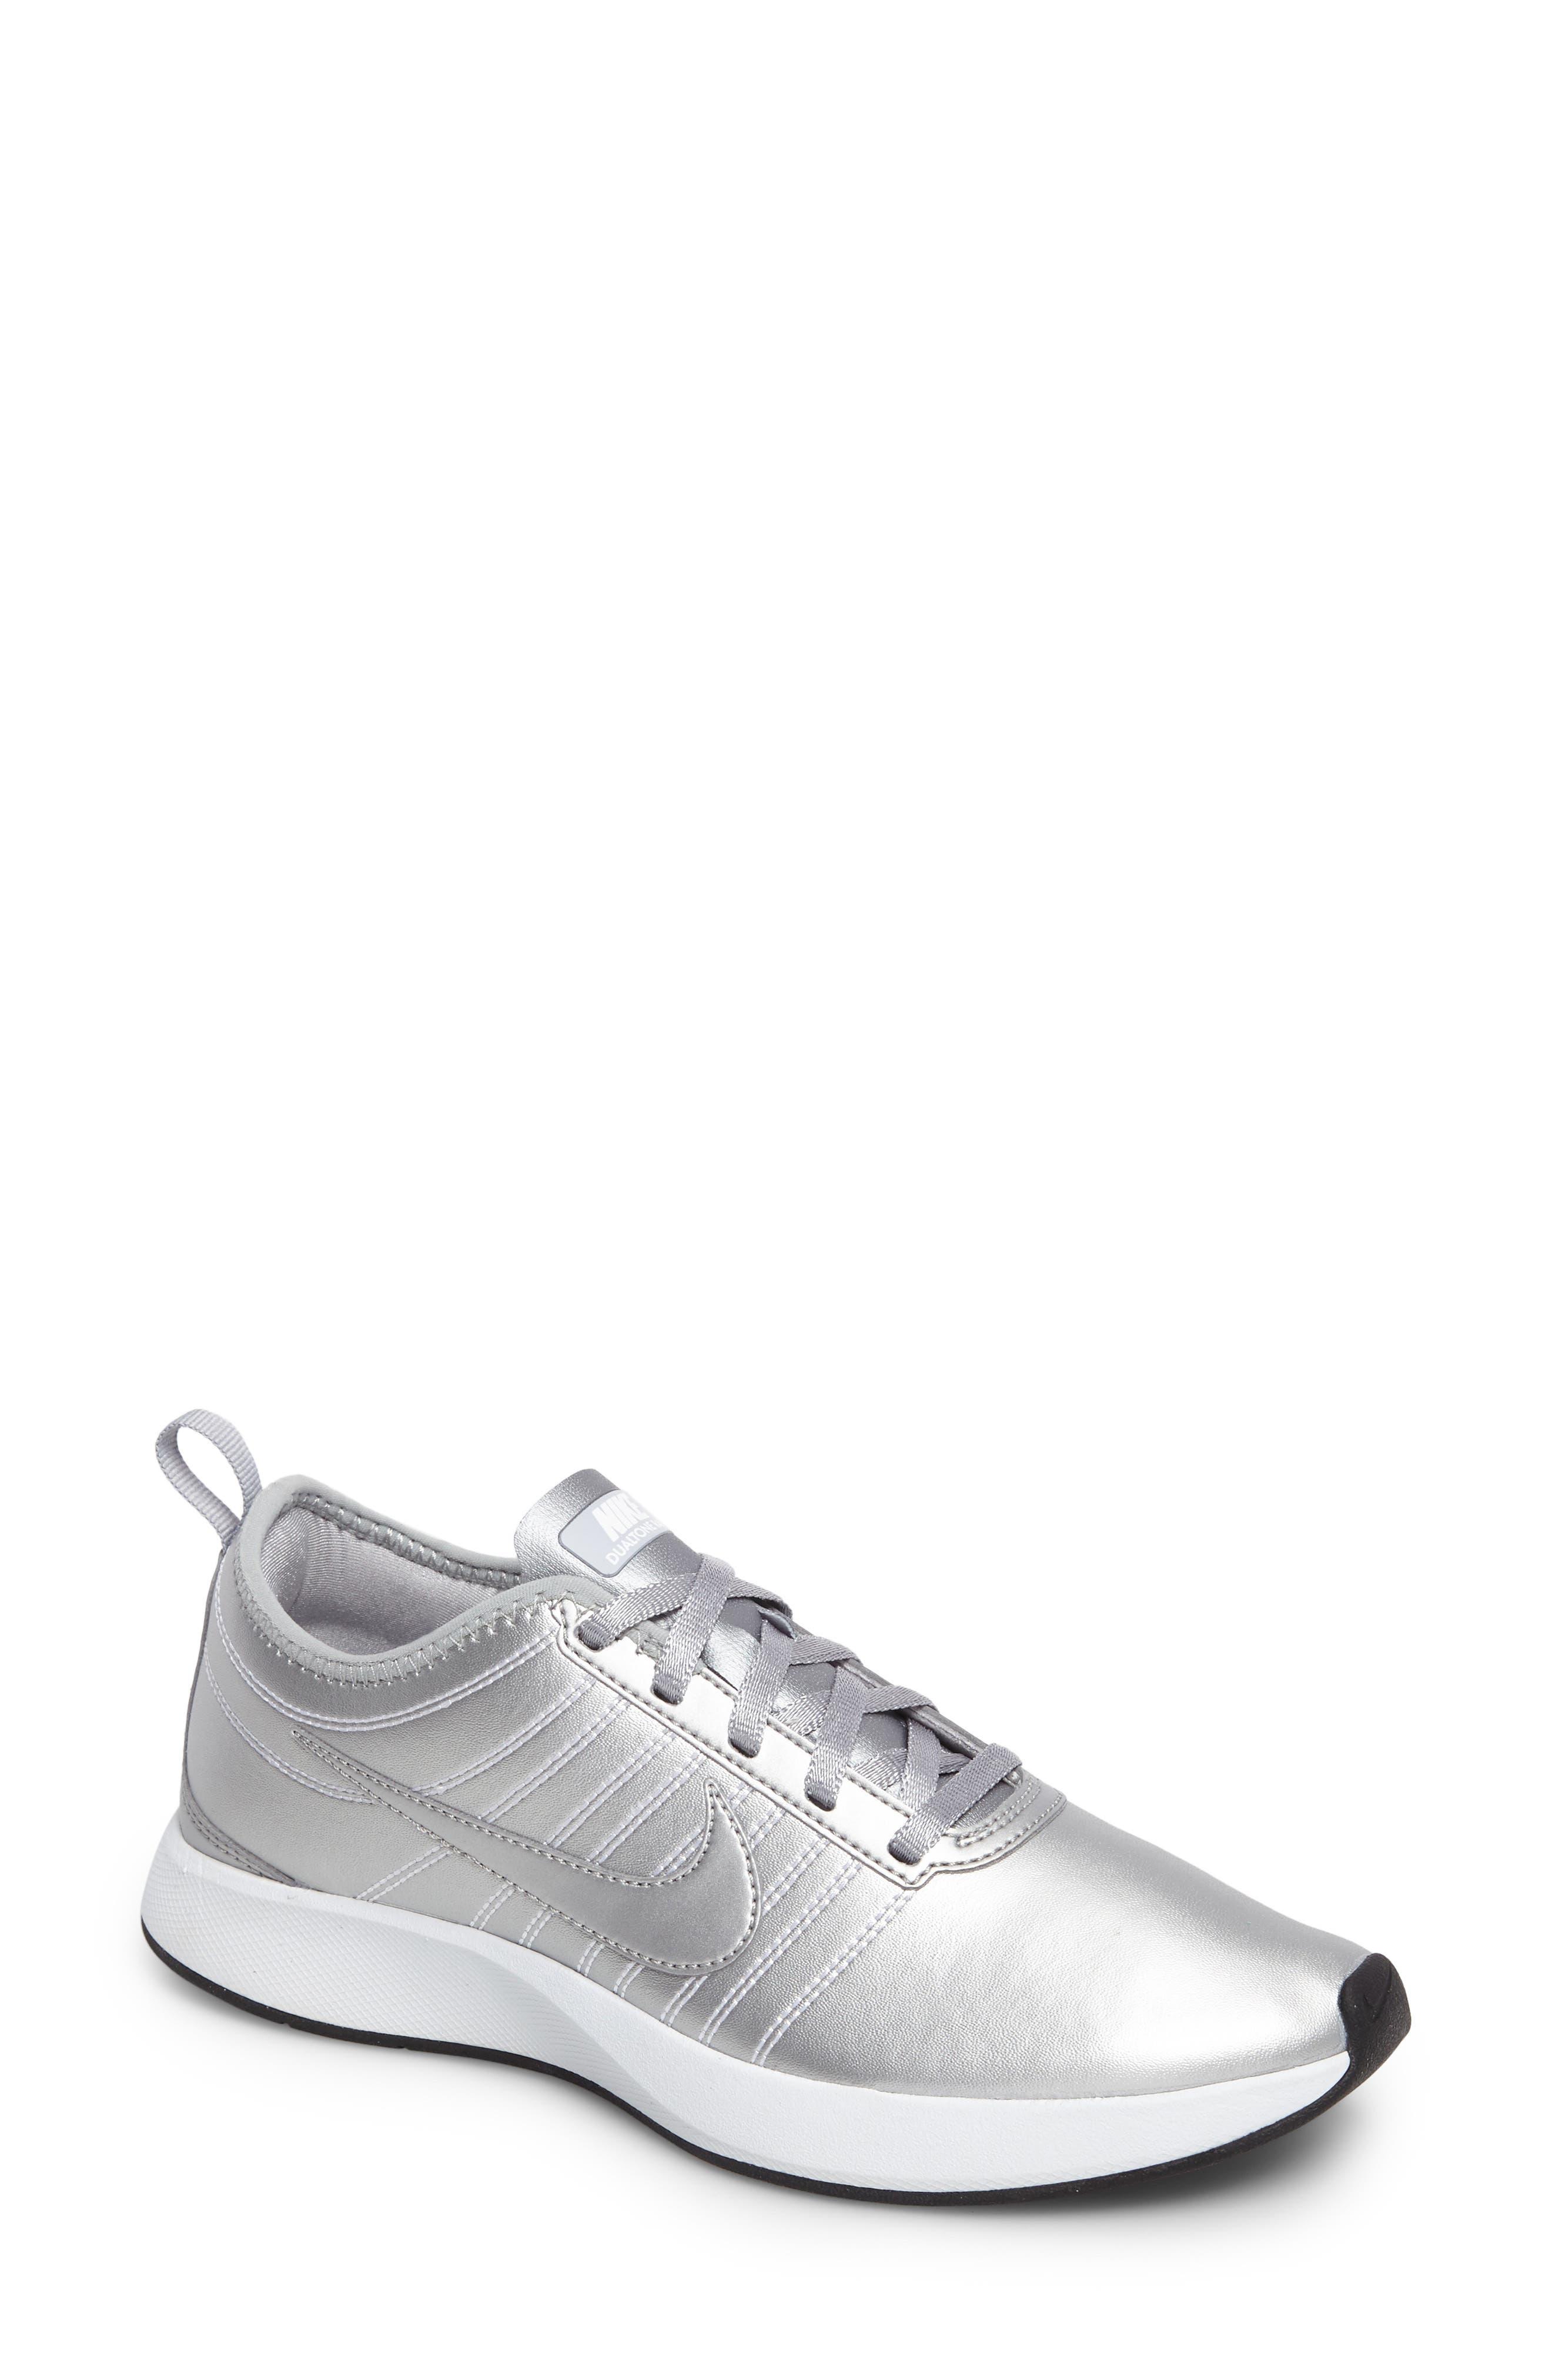 Dualtone Racer PRM Sneaker,                             Main thumbnail 4, color,